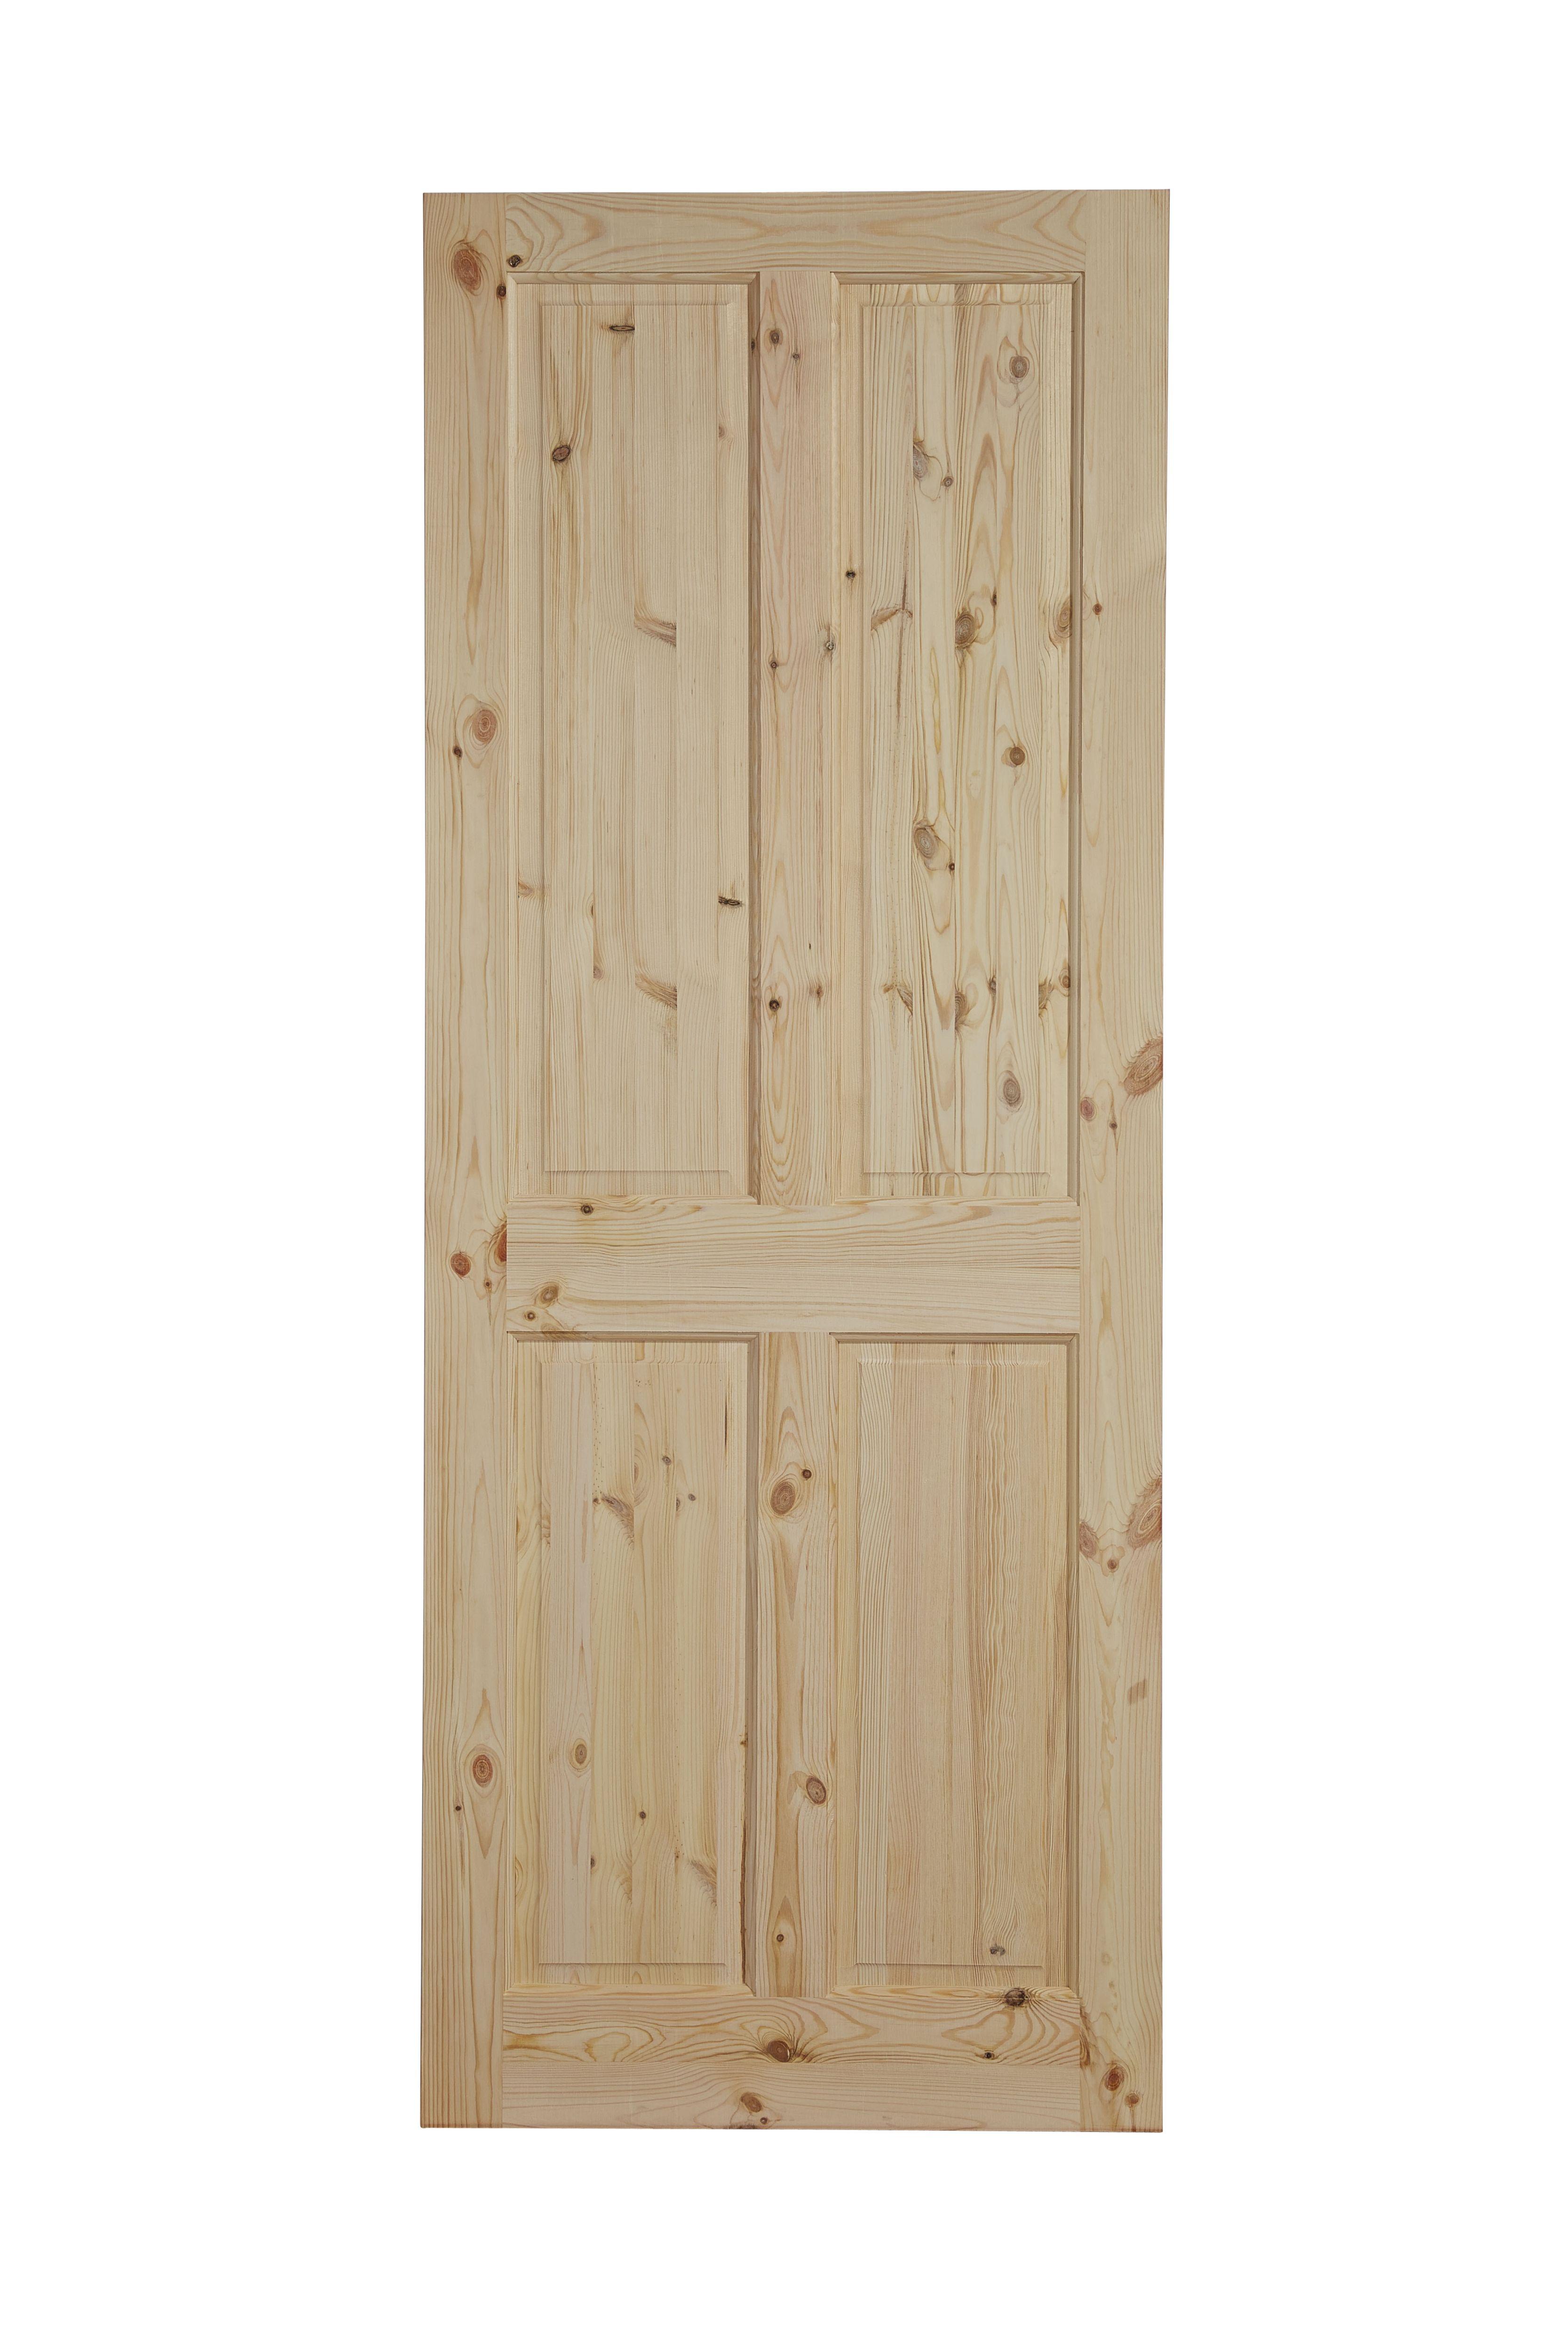 online retailer 9a3f1 8dff0 4 Panel Knotty pine Internal Standard Door, (H)1981mm (W)610mm |  Departments | DIY at B&Q